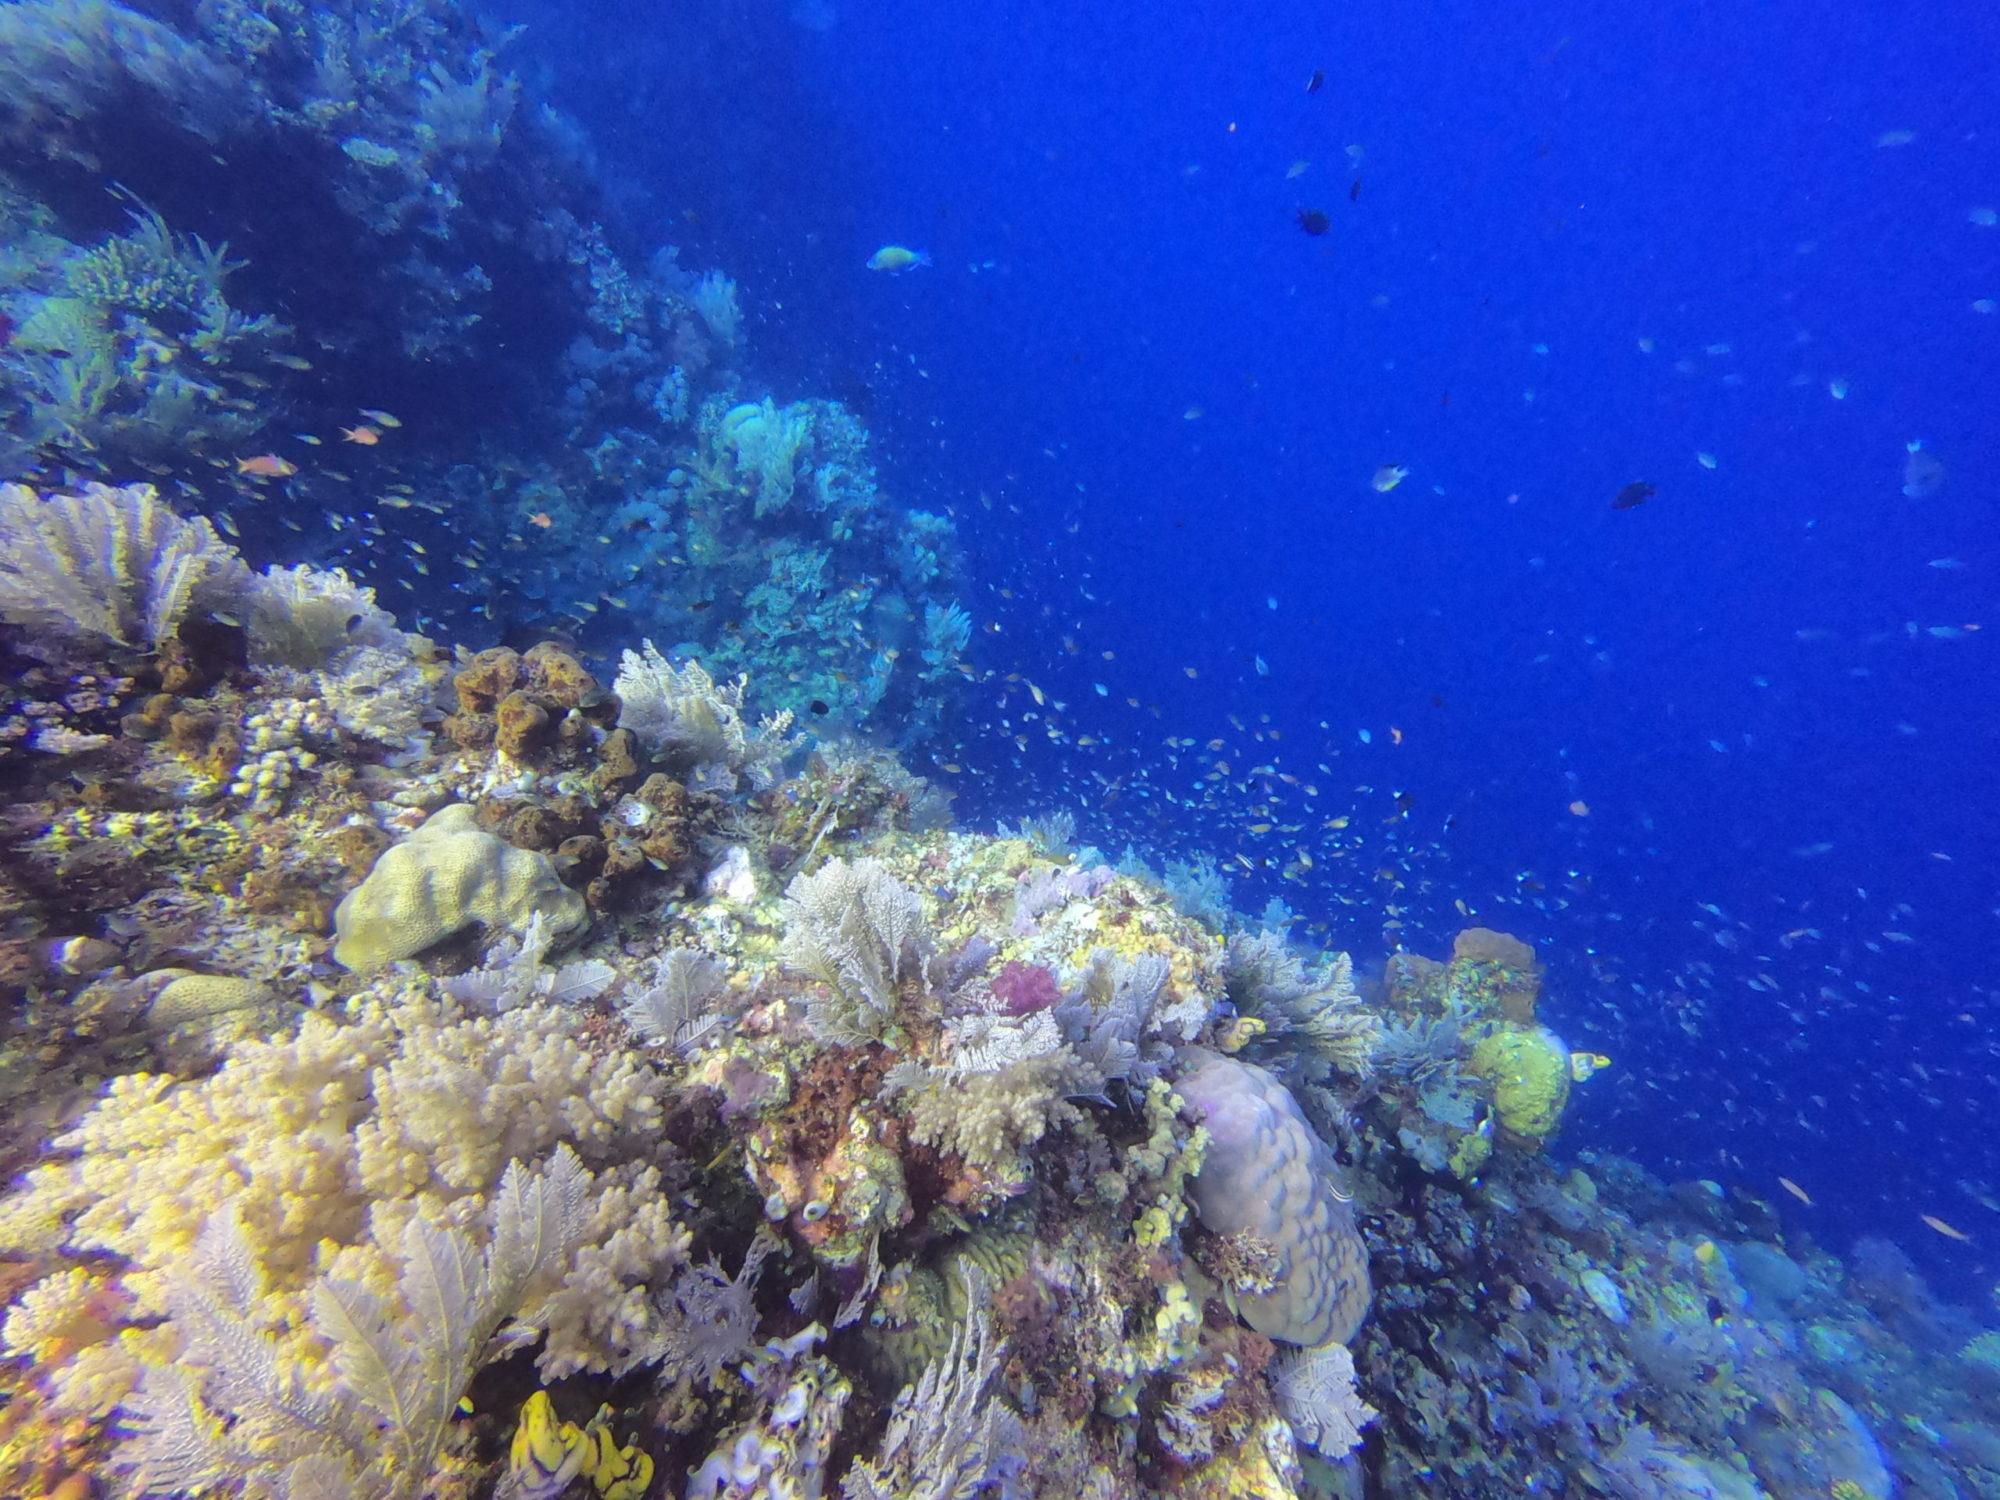 Pulau raja dive site flores